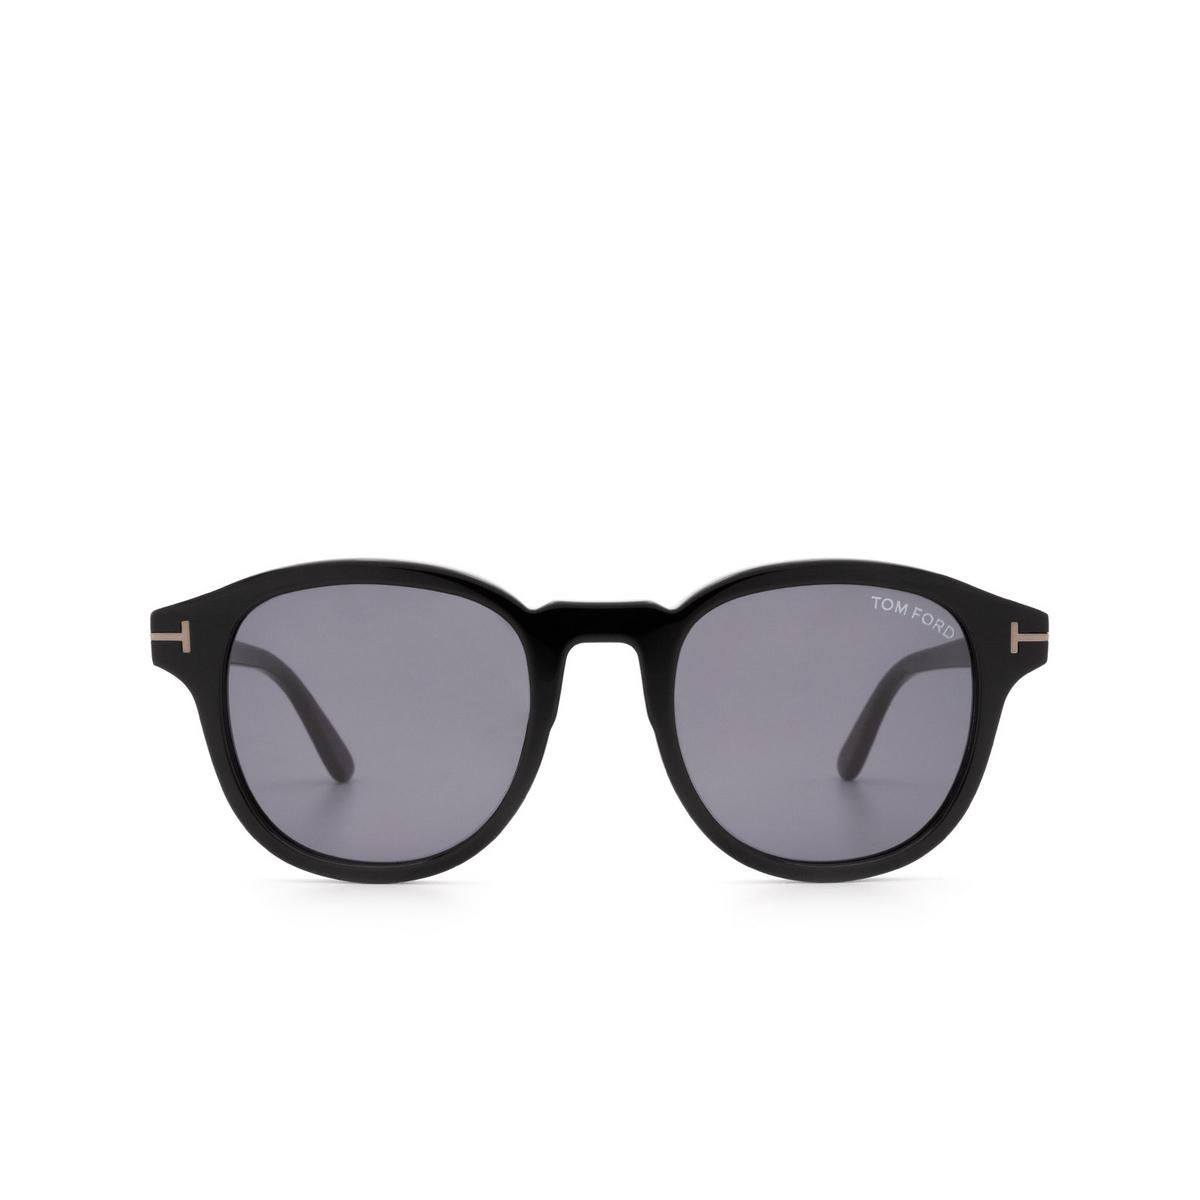 Tom Ford® Square Sunglasses: Jameson FT0752-N color Black 01A.